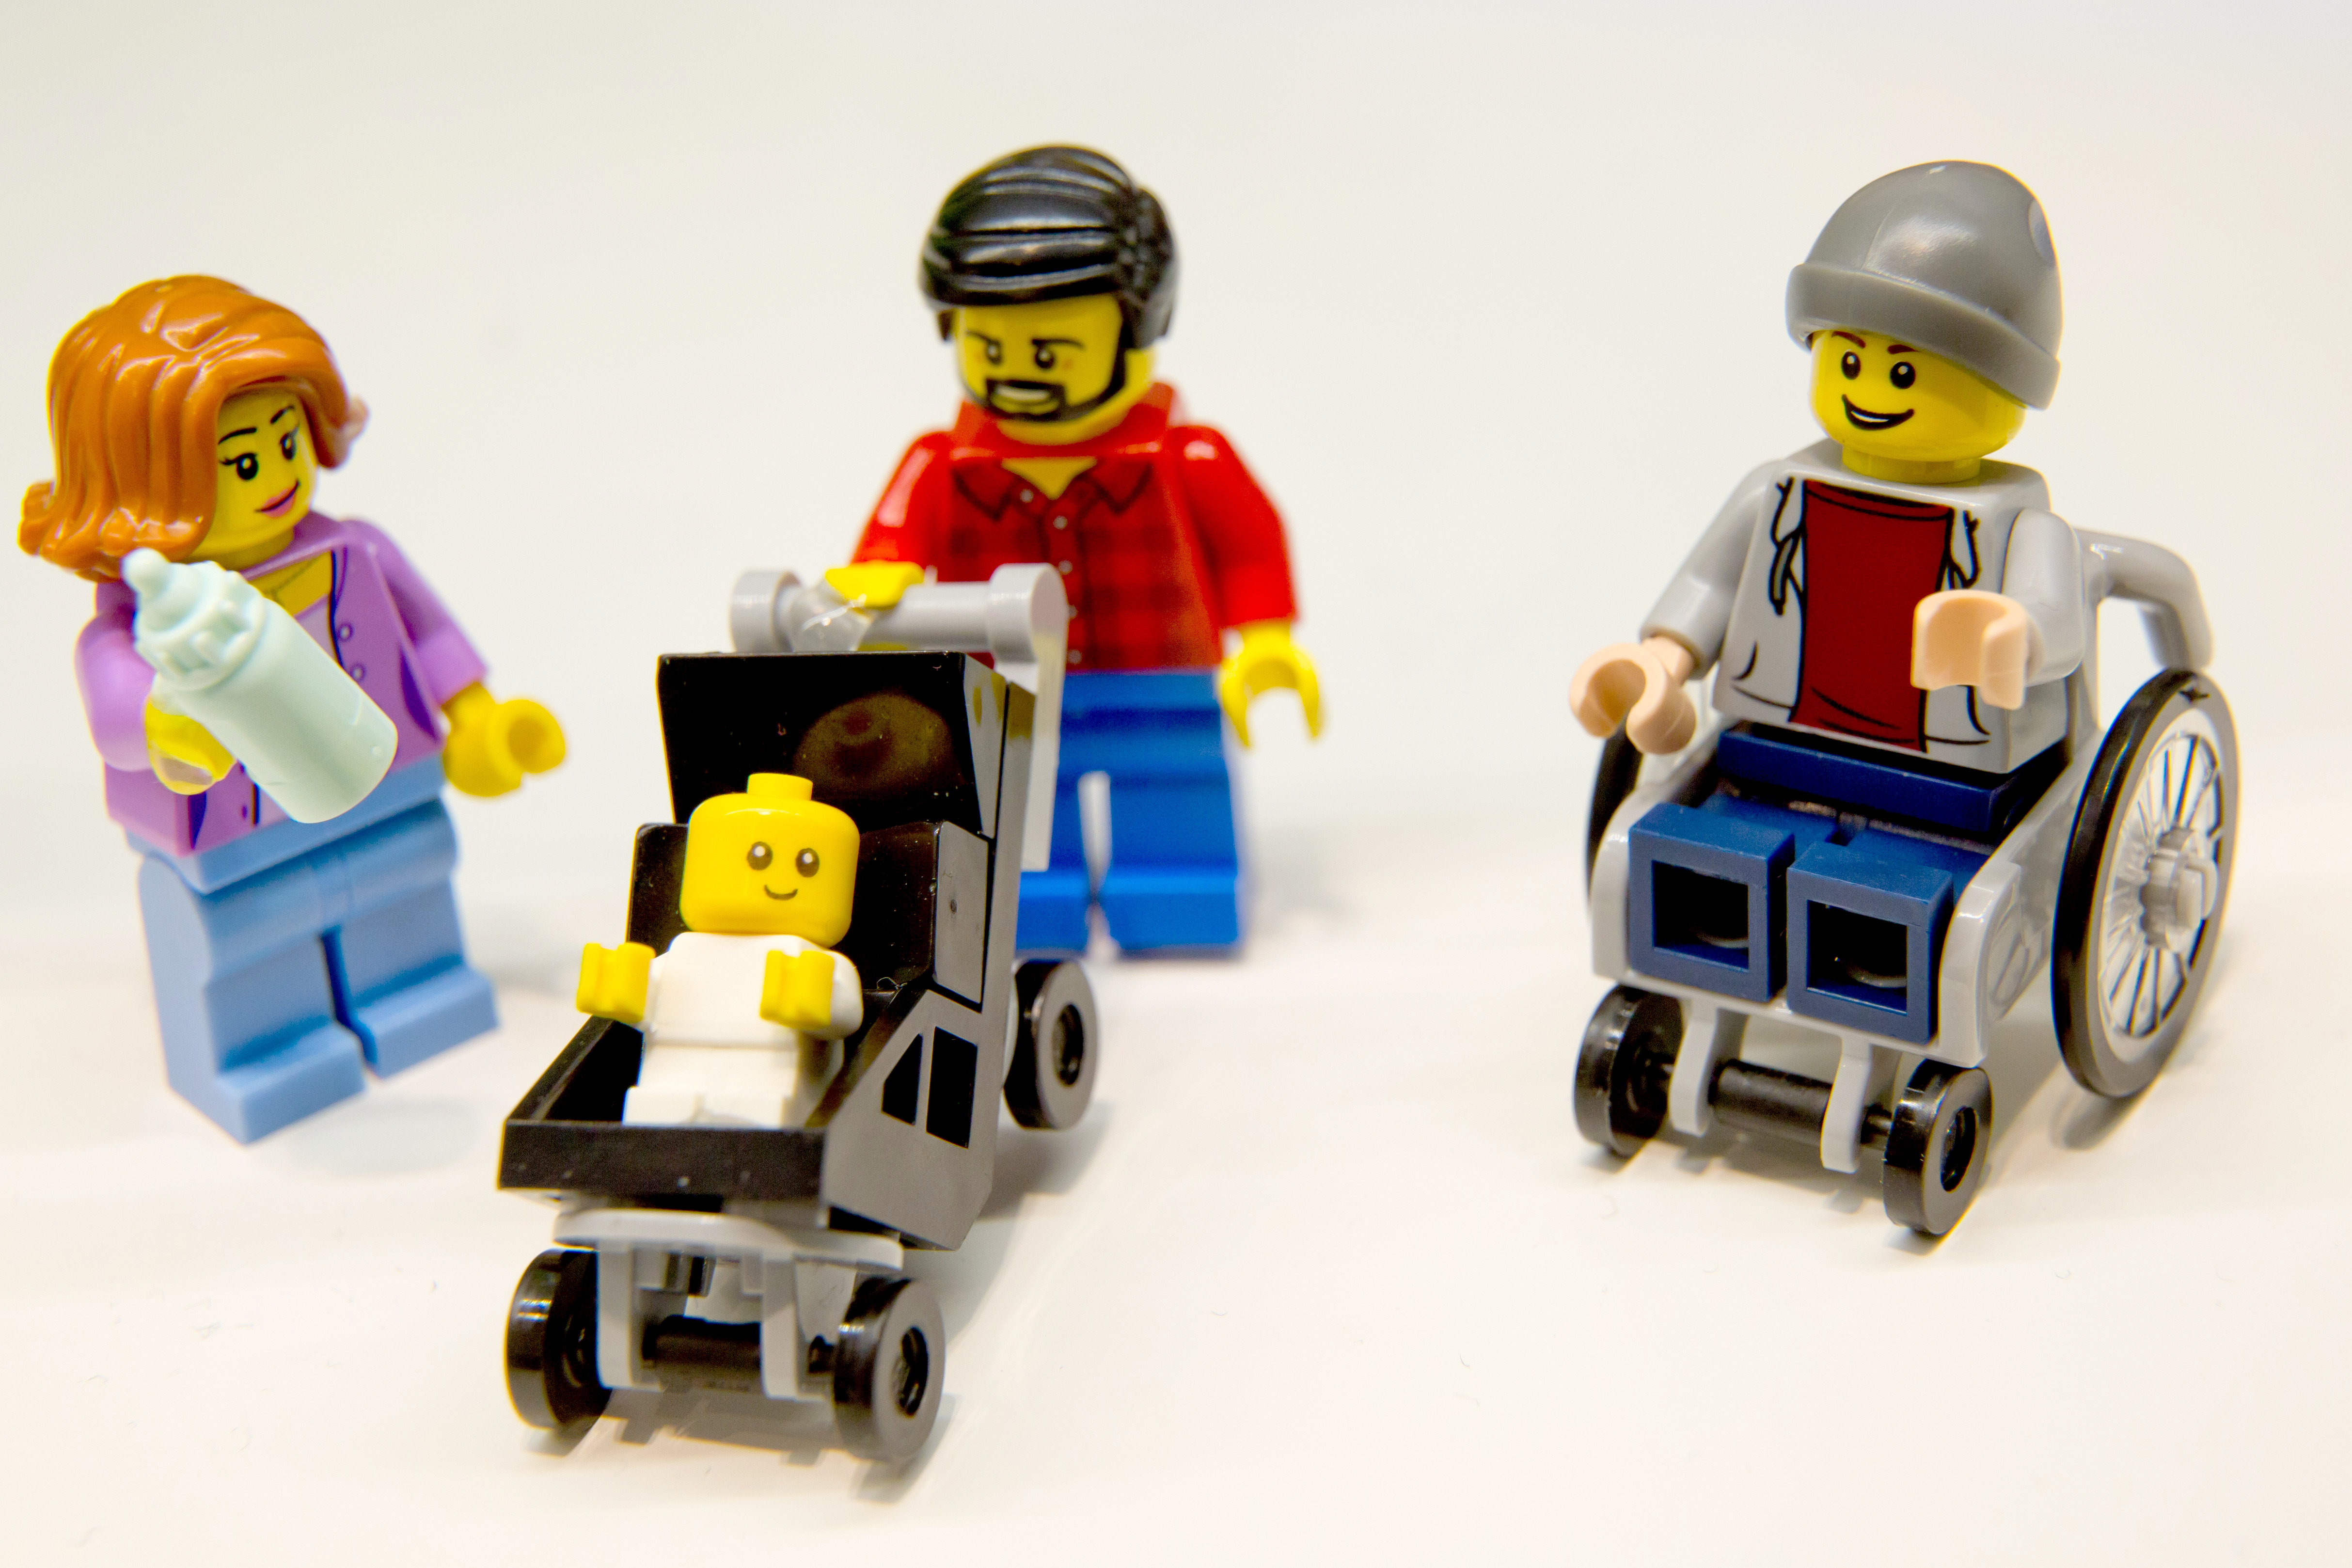 GERMANY-TOYS-LEGO